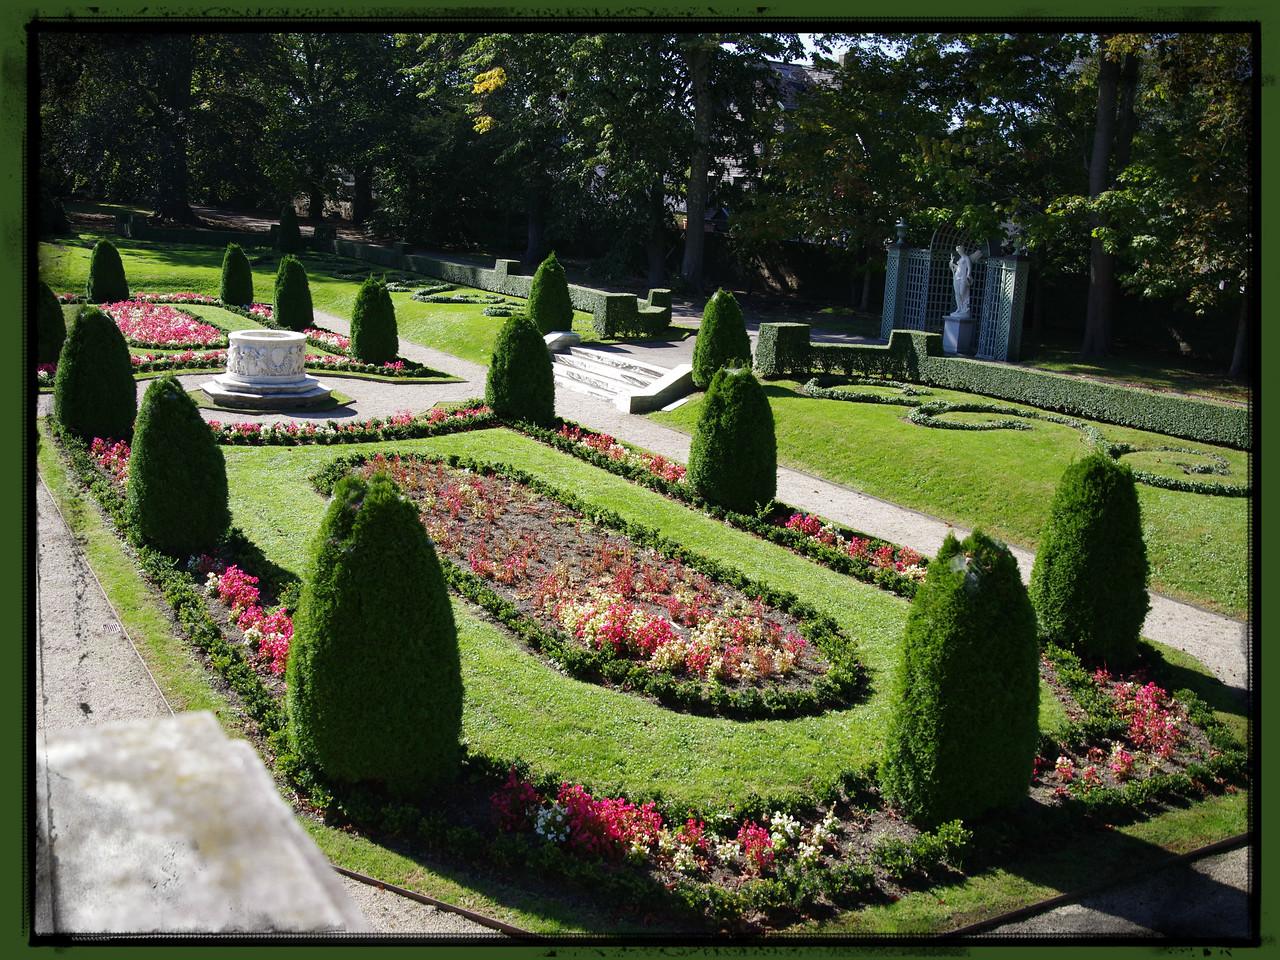 Sunken Garden at the Elms